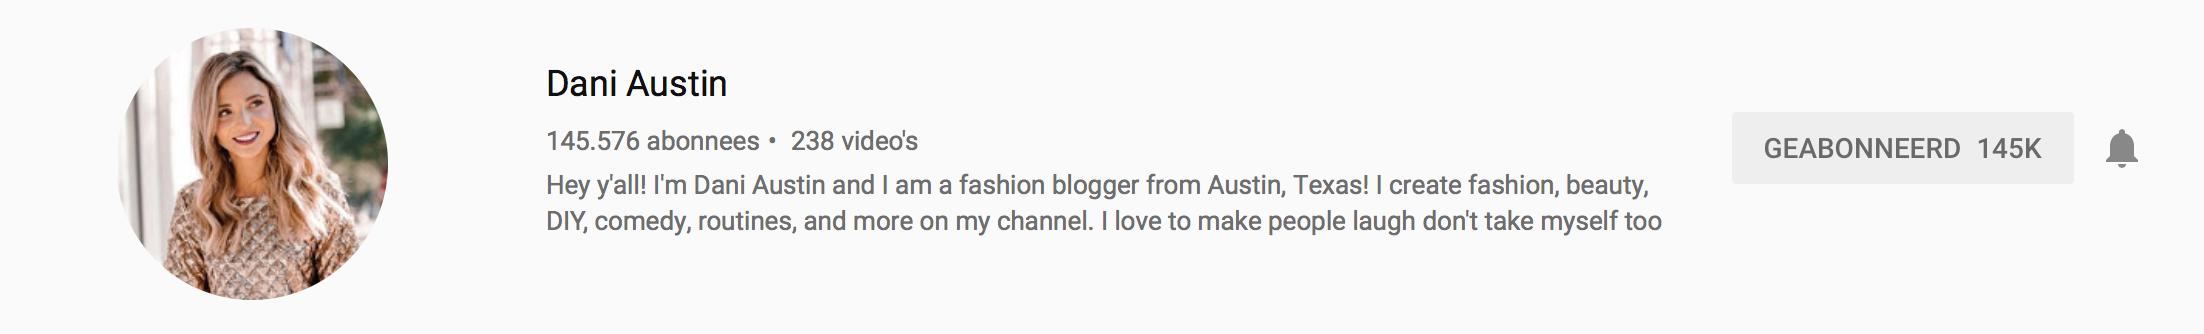 YouTubers I recently followed: Dani Austin